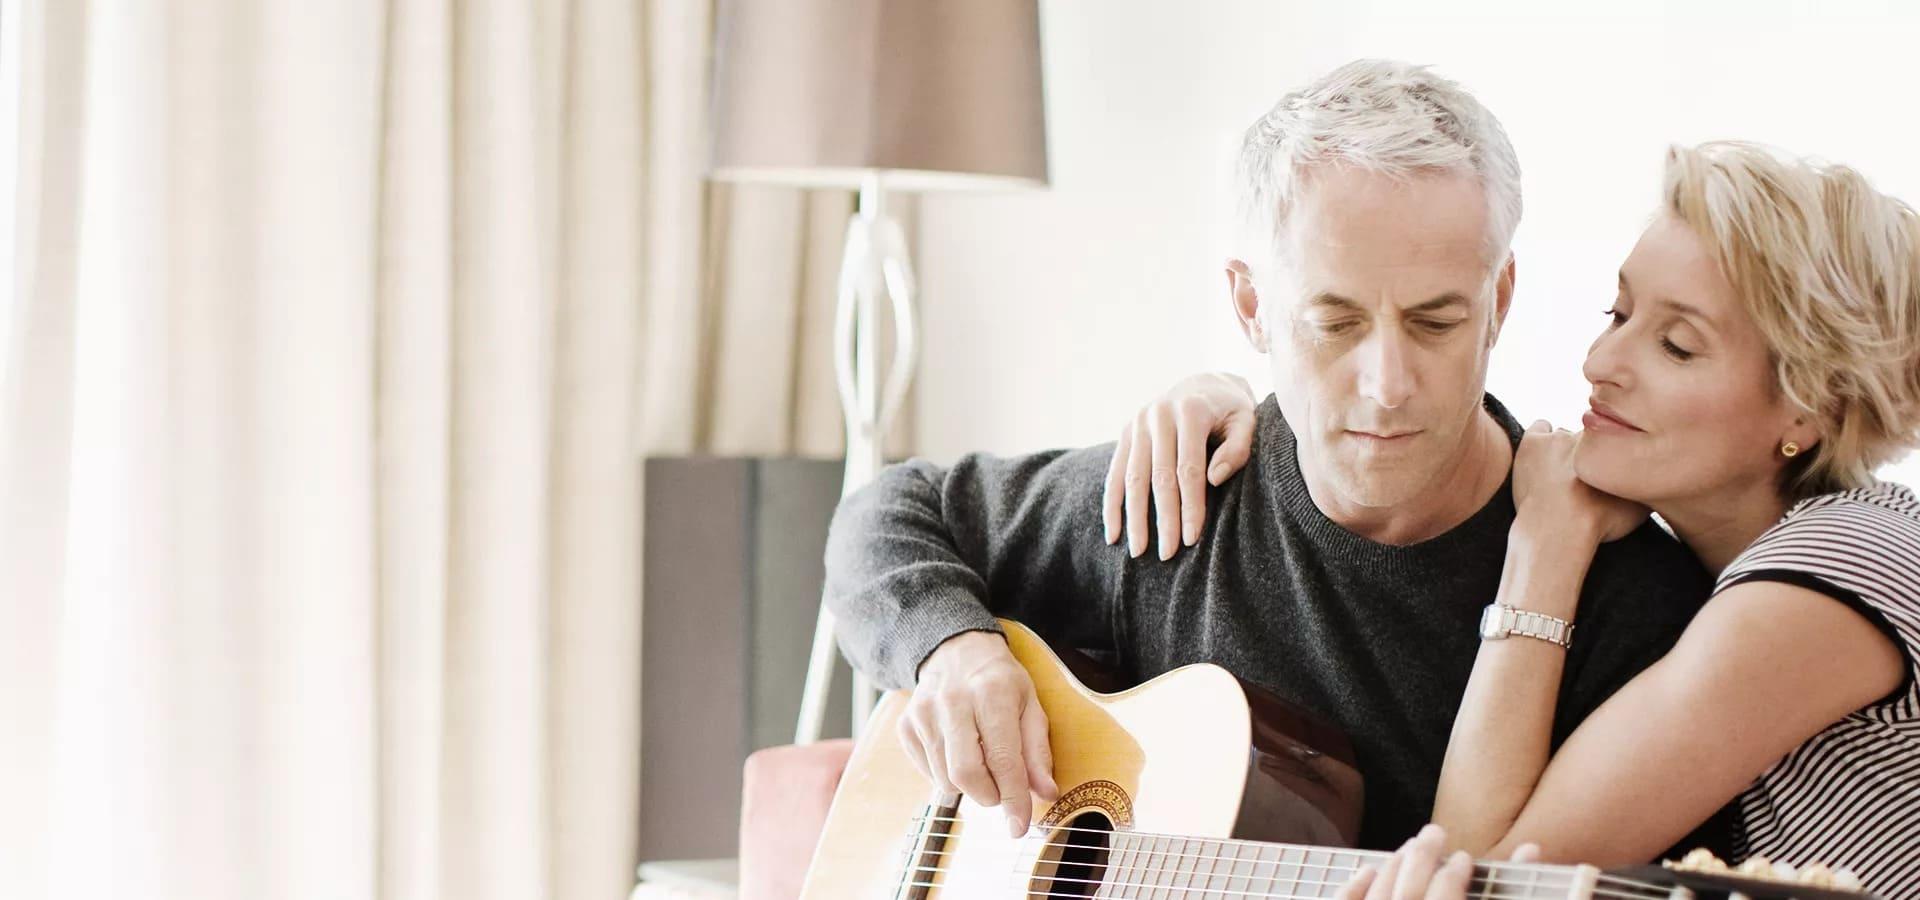 deaf man playing guitar